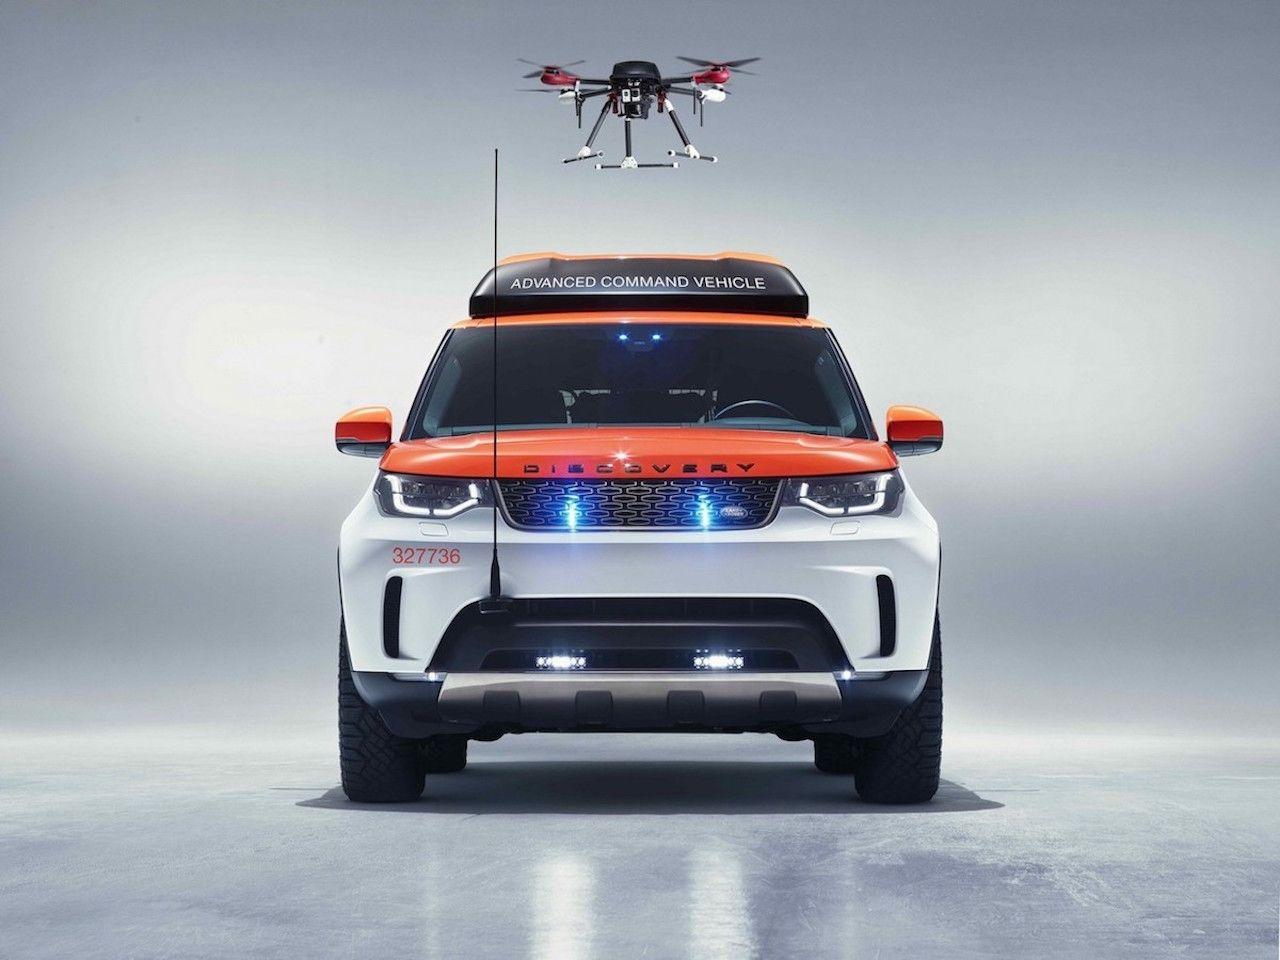 land rover discovery project hero el futuro del rescate coches rh pinterest co uk